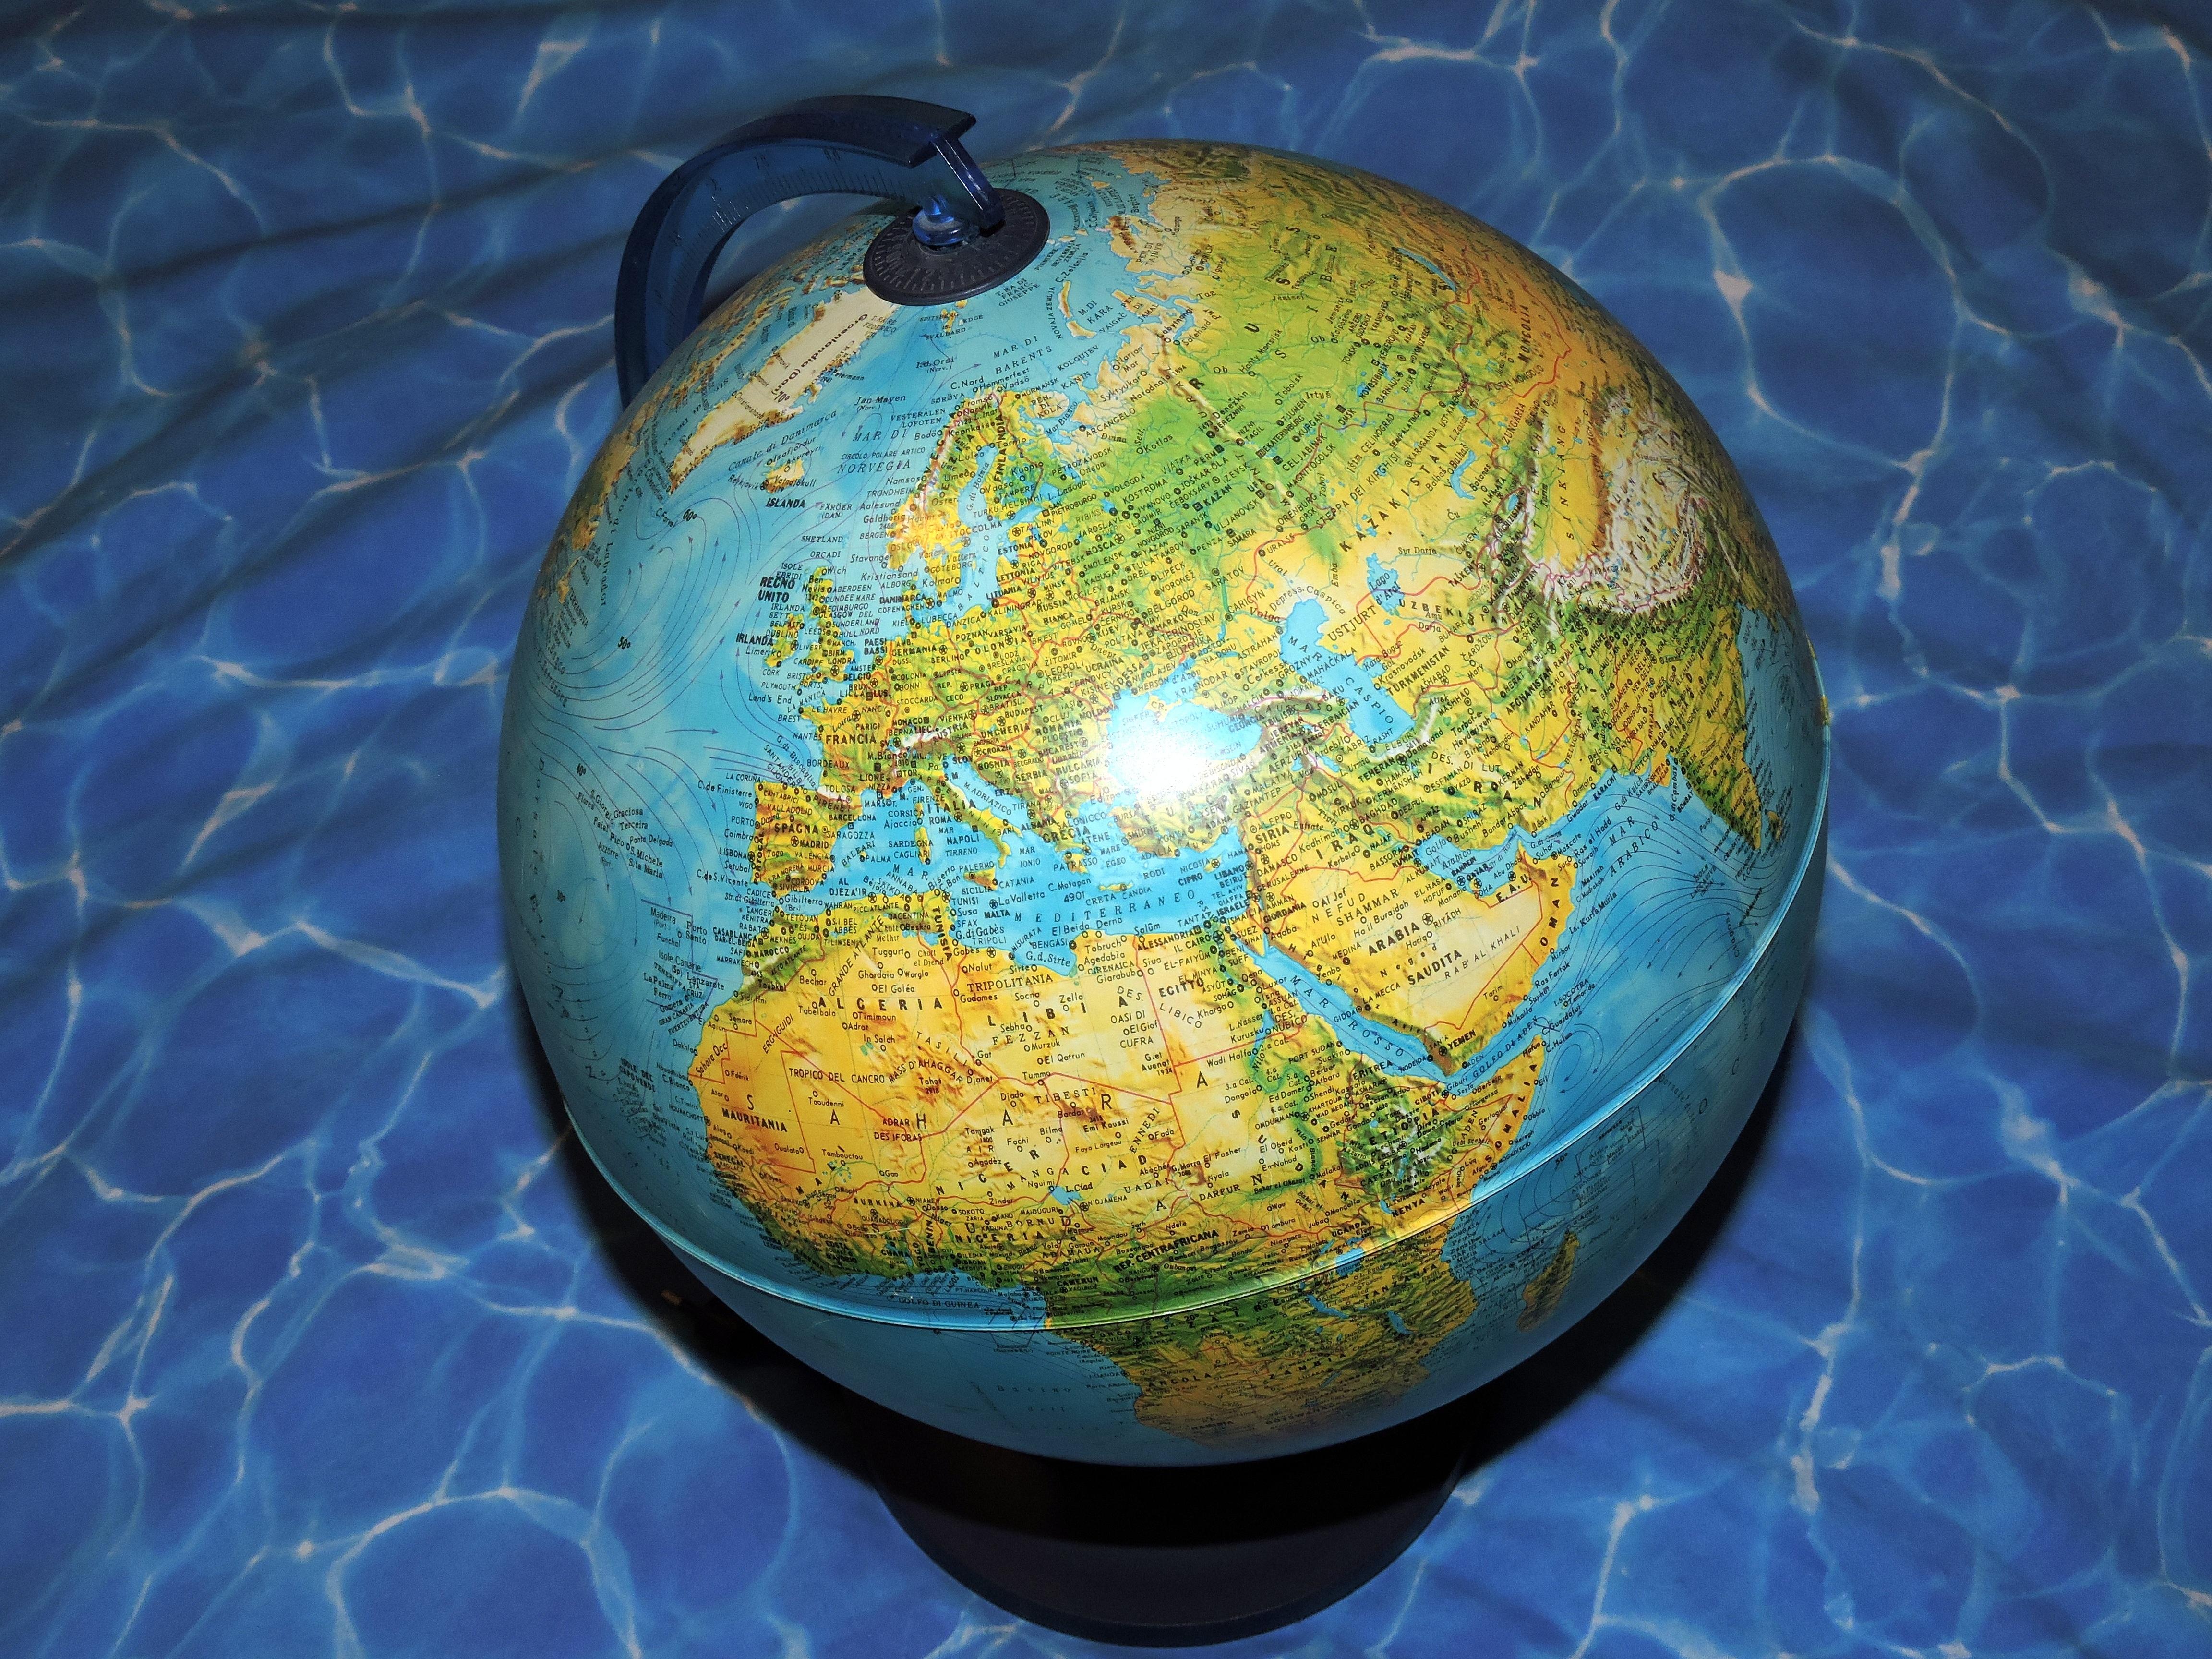 Free Images  sea circle globe egg earth ball sphere planet